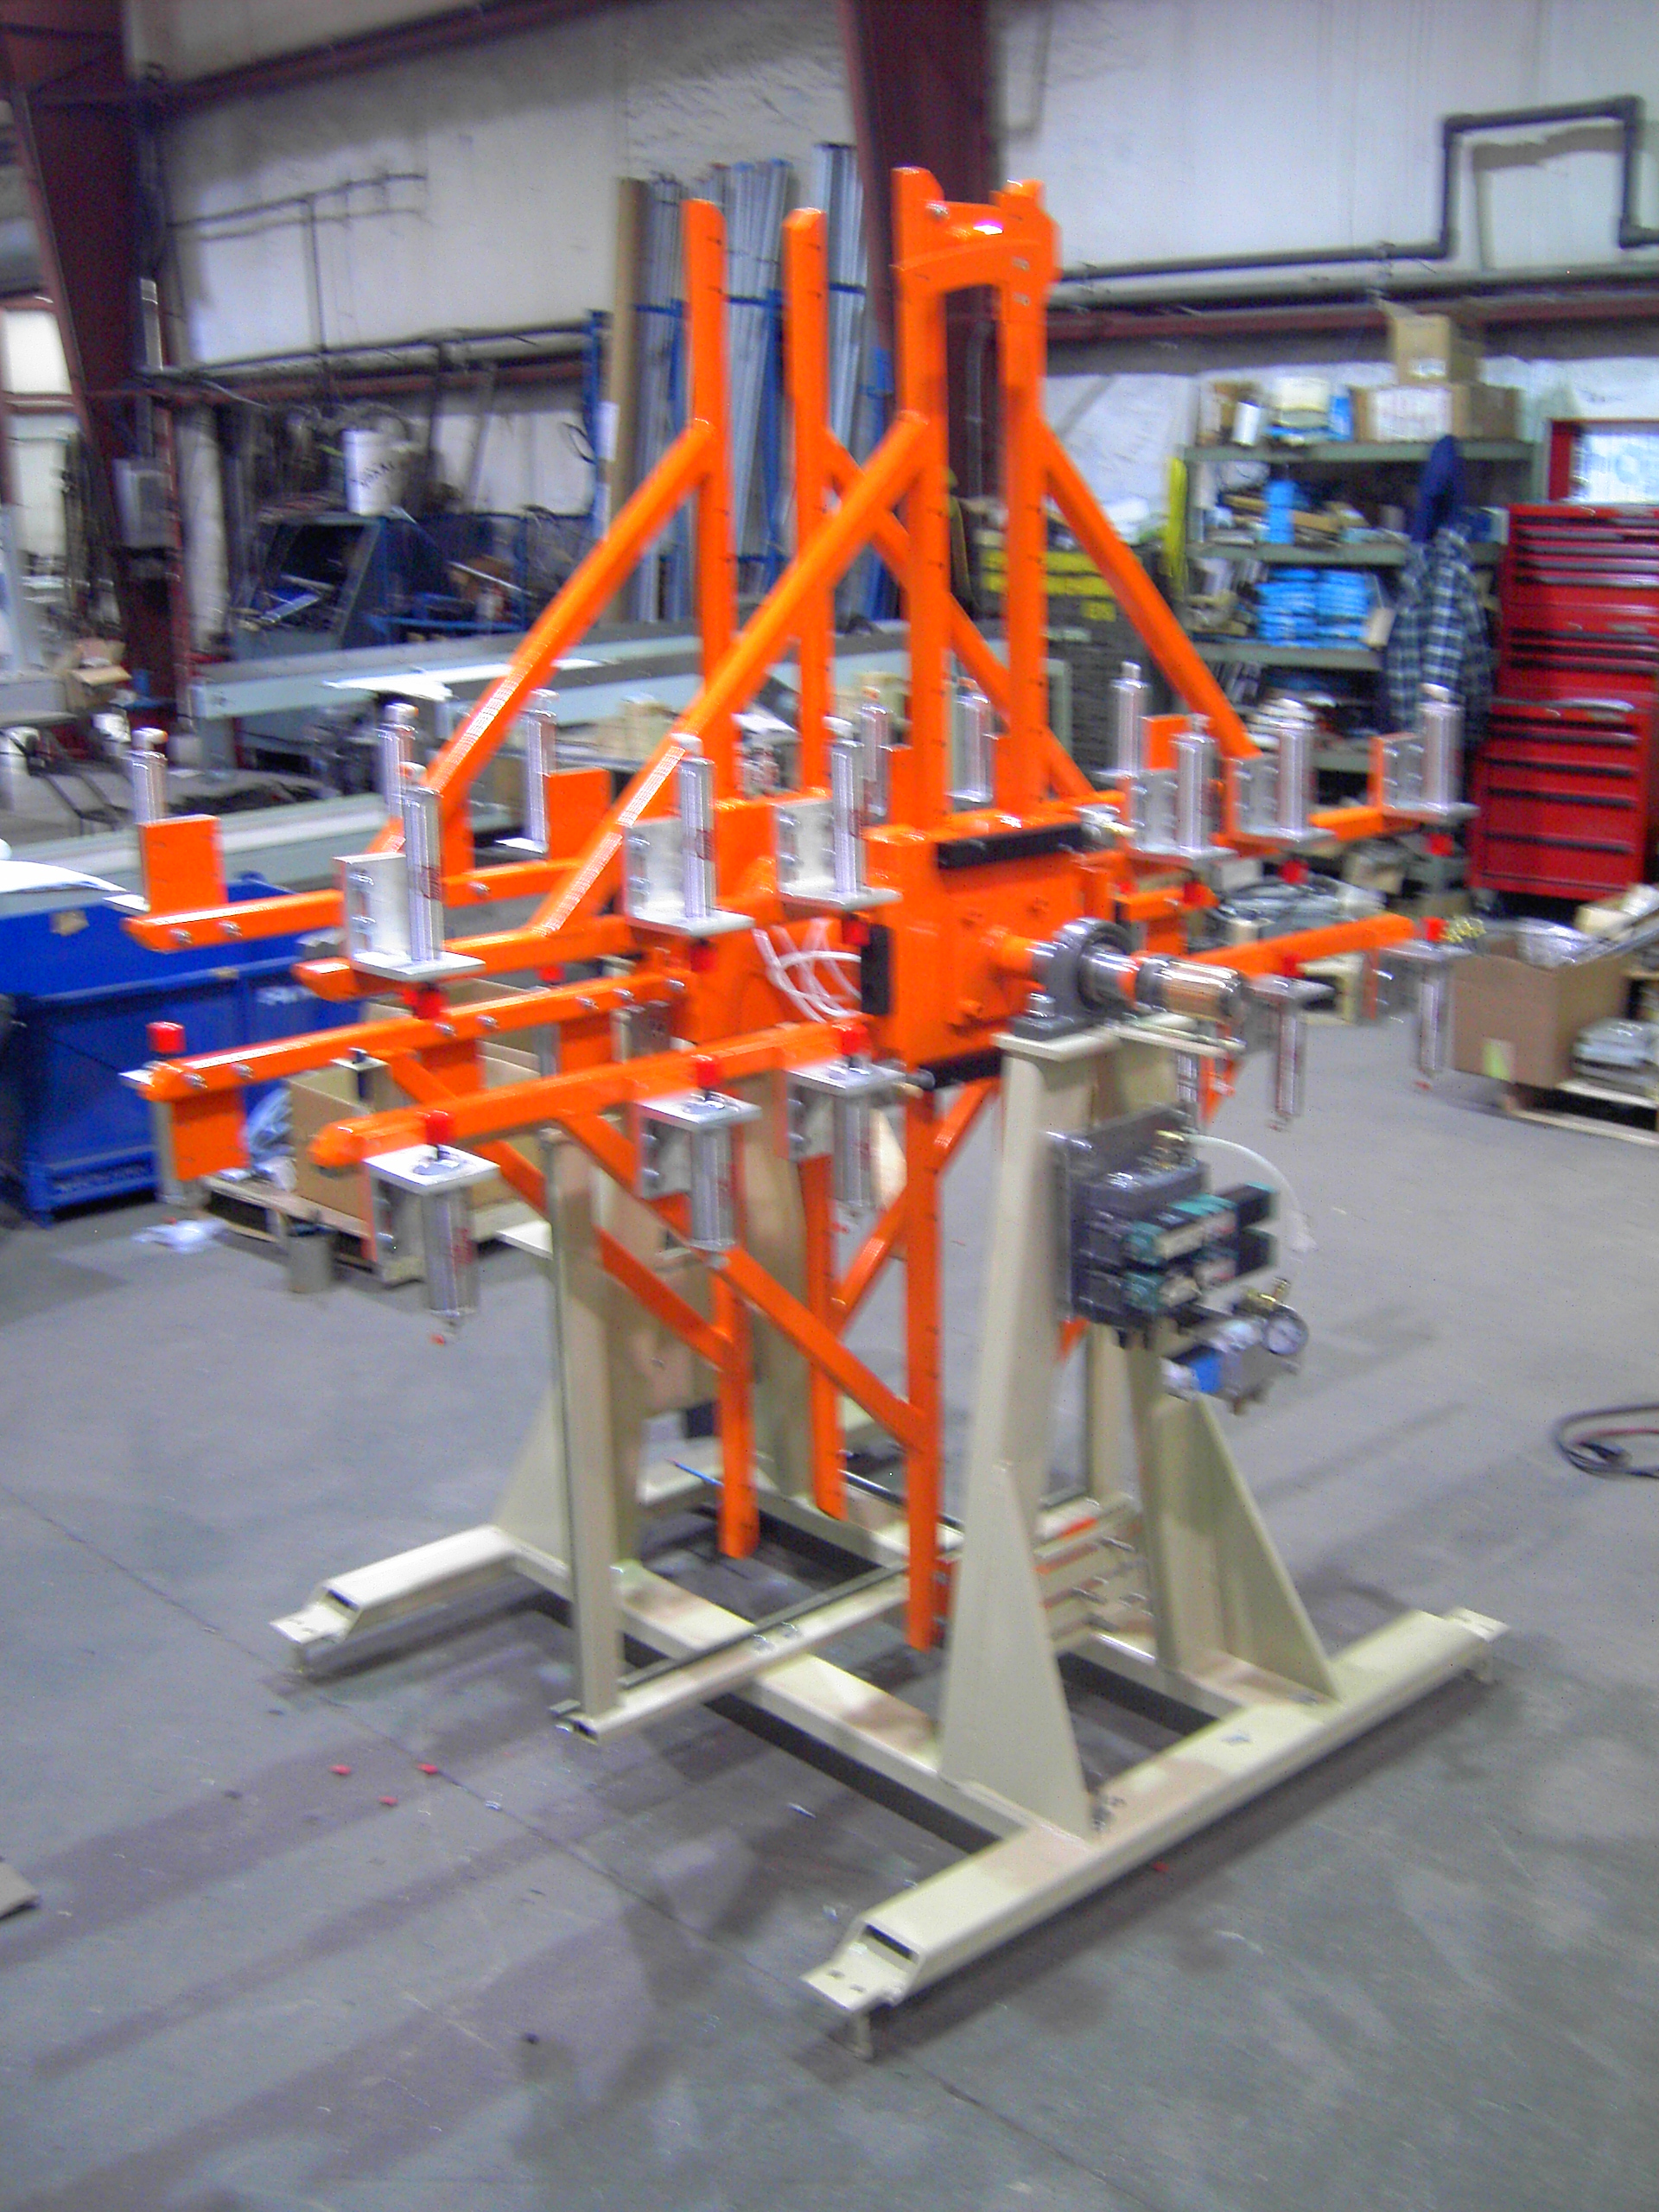 Laminated Automotive Glass De-Airing Line(Nipper Line) - Digital StillCamera